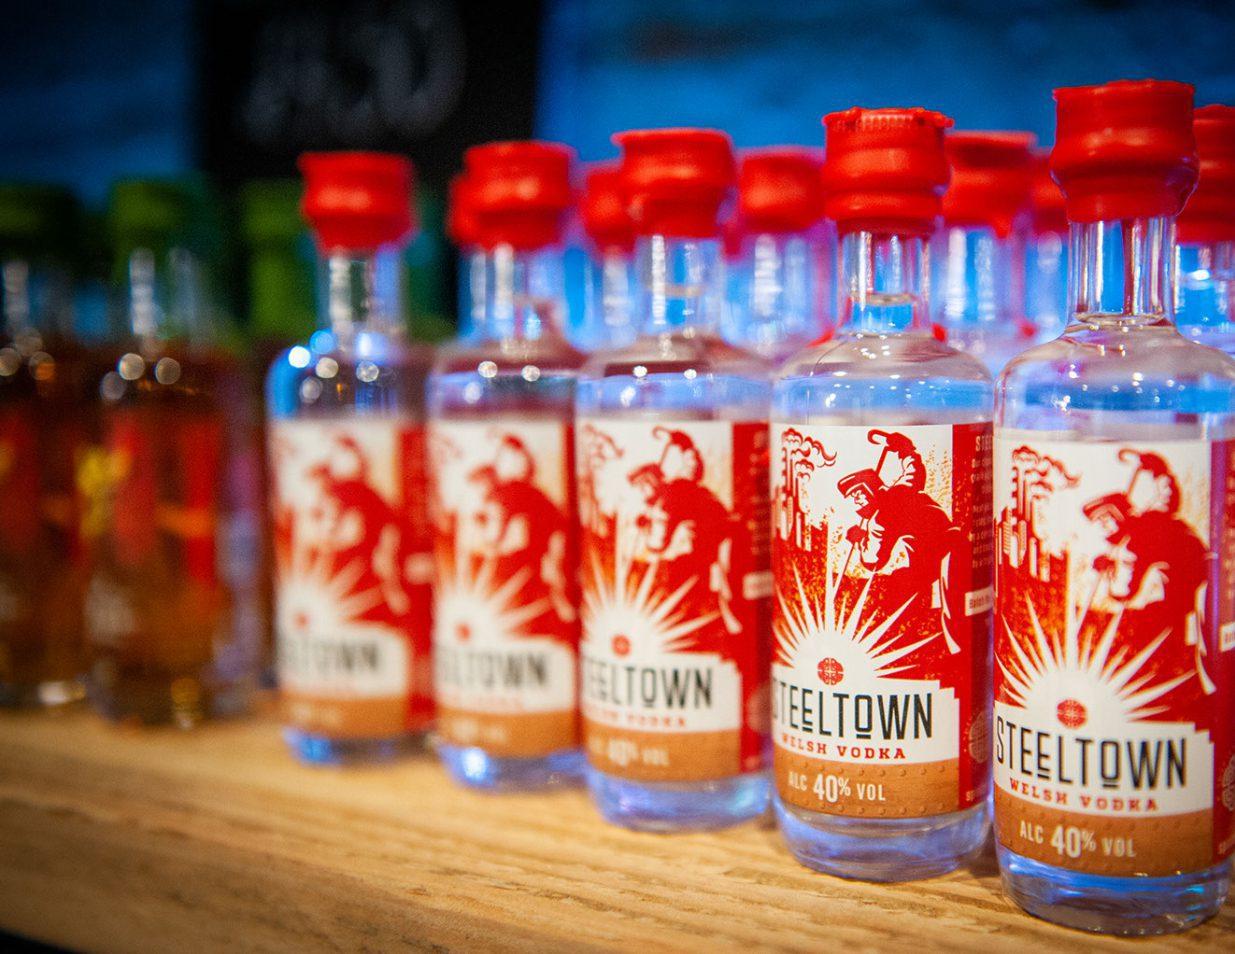 Spirit of Wales Distillery Steeltown Welsh Vodka filtered through Anthracite in Newport Wales